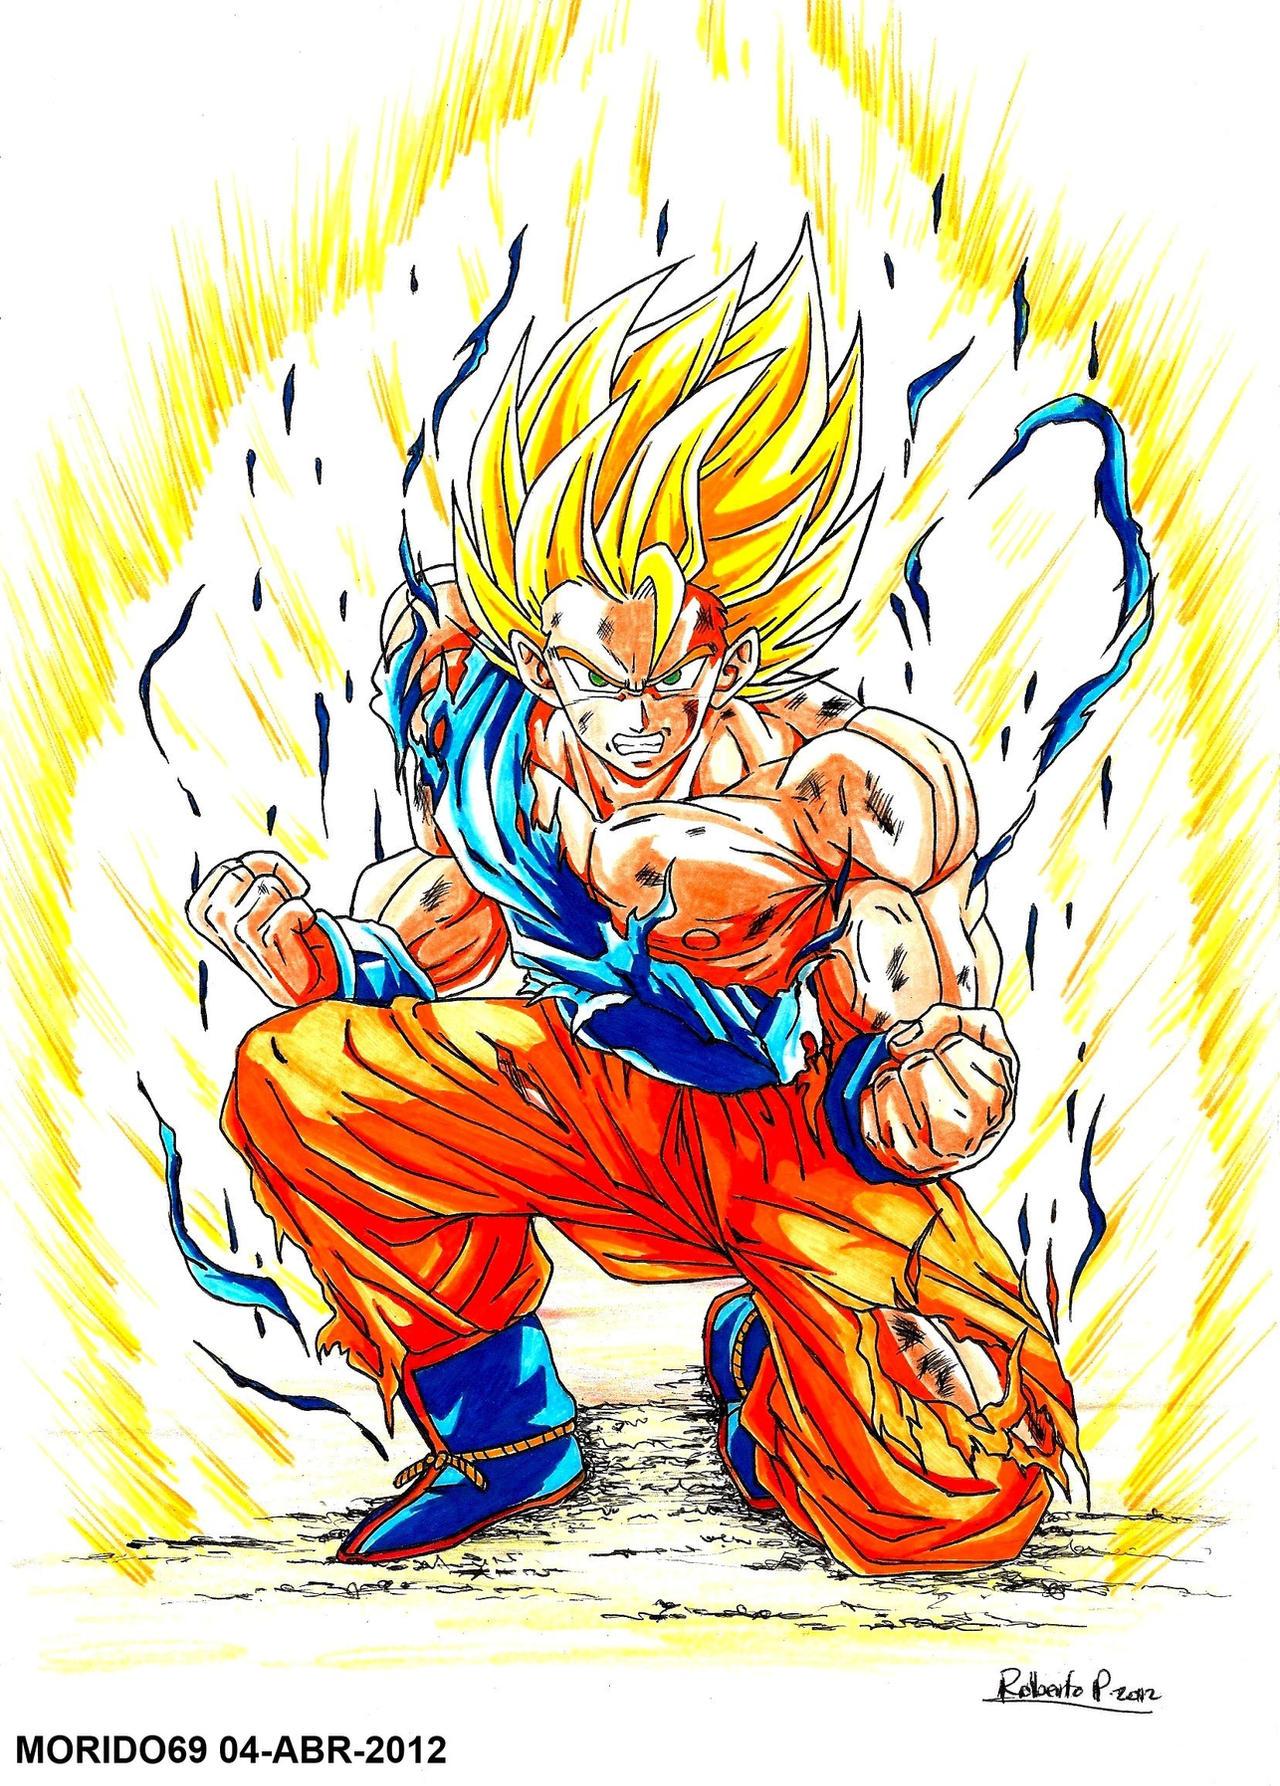 curiosidades Goku_super_saiyajin_dragon_ball_z__marker_color__by_muertito69-d4ykkk0